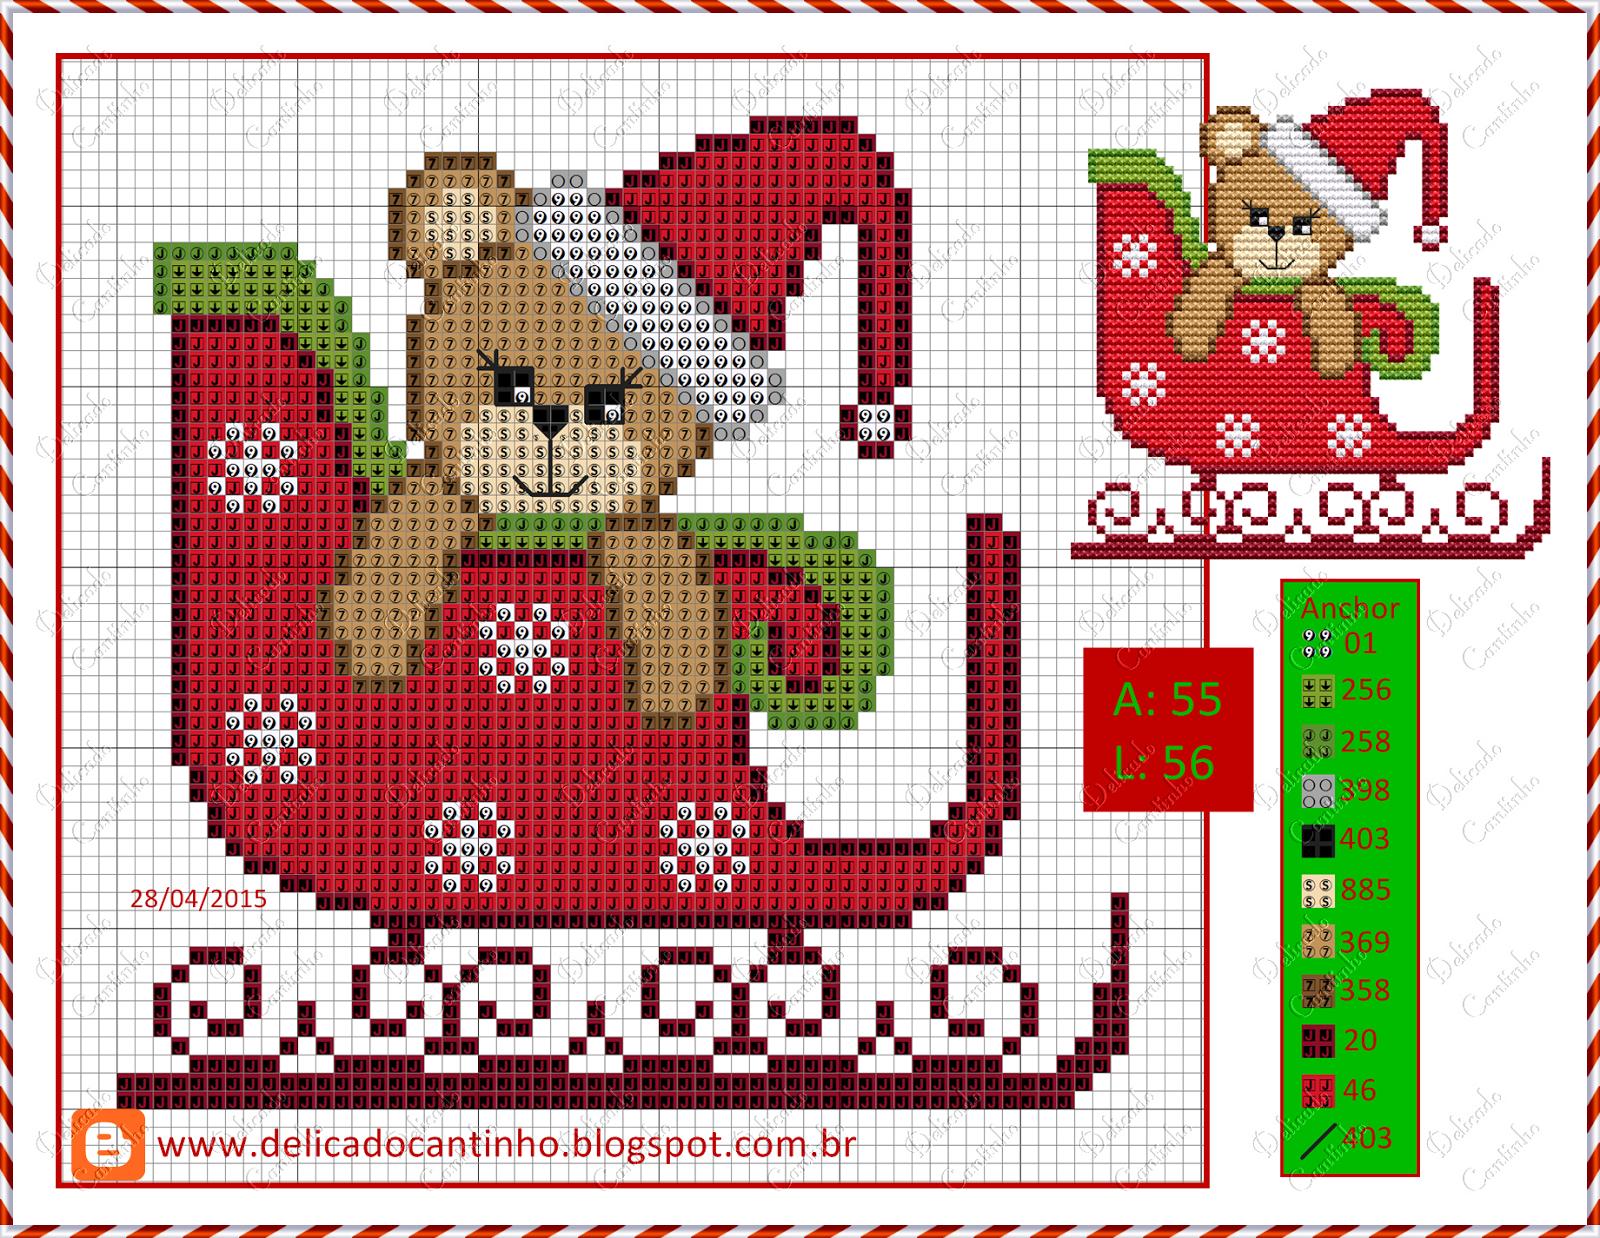 Pin de Emilie en broderie Noël | Pinterest | Puntos, Punto de cruz y ...